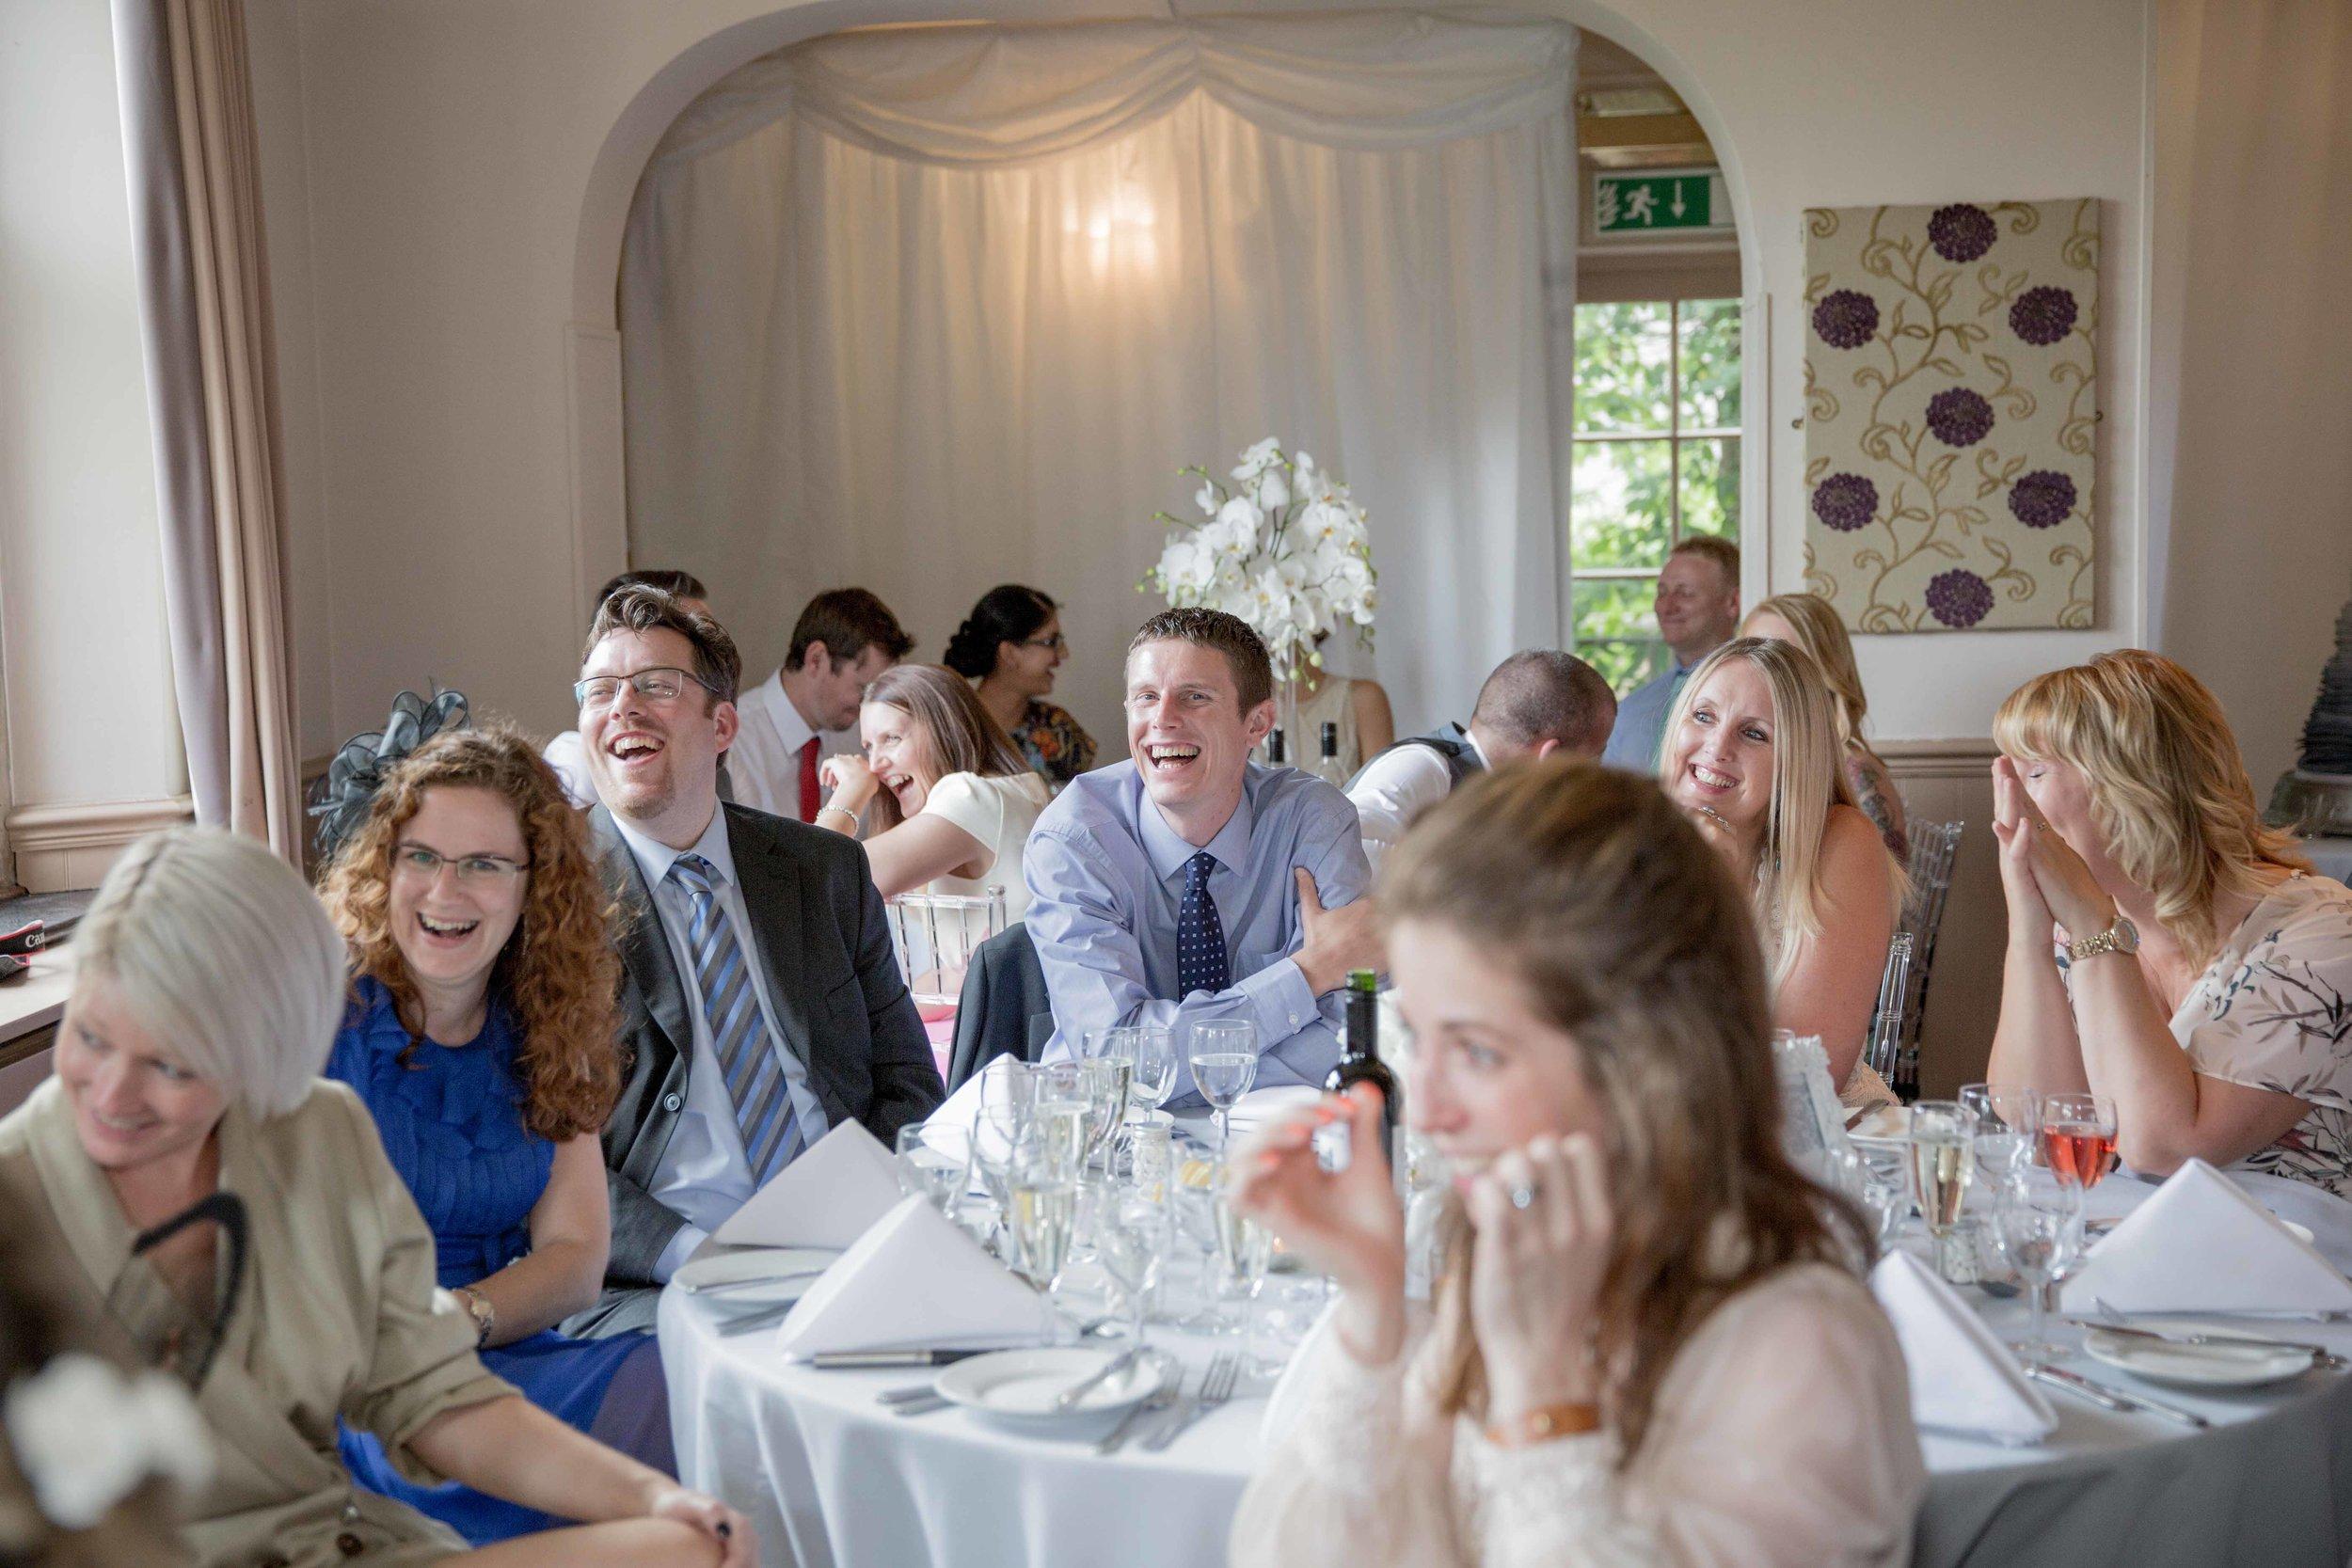 cotswold-wedding-photography-at-stonehouse-court-hotel-natalia-smith-photography-gloucestershire-wedding-photographer-77.jpg